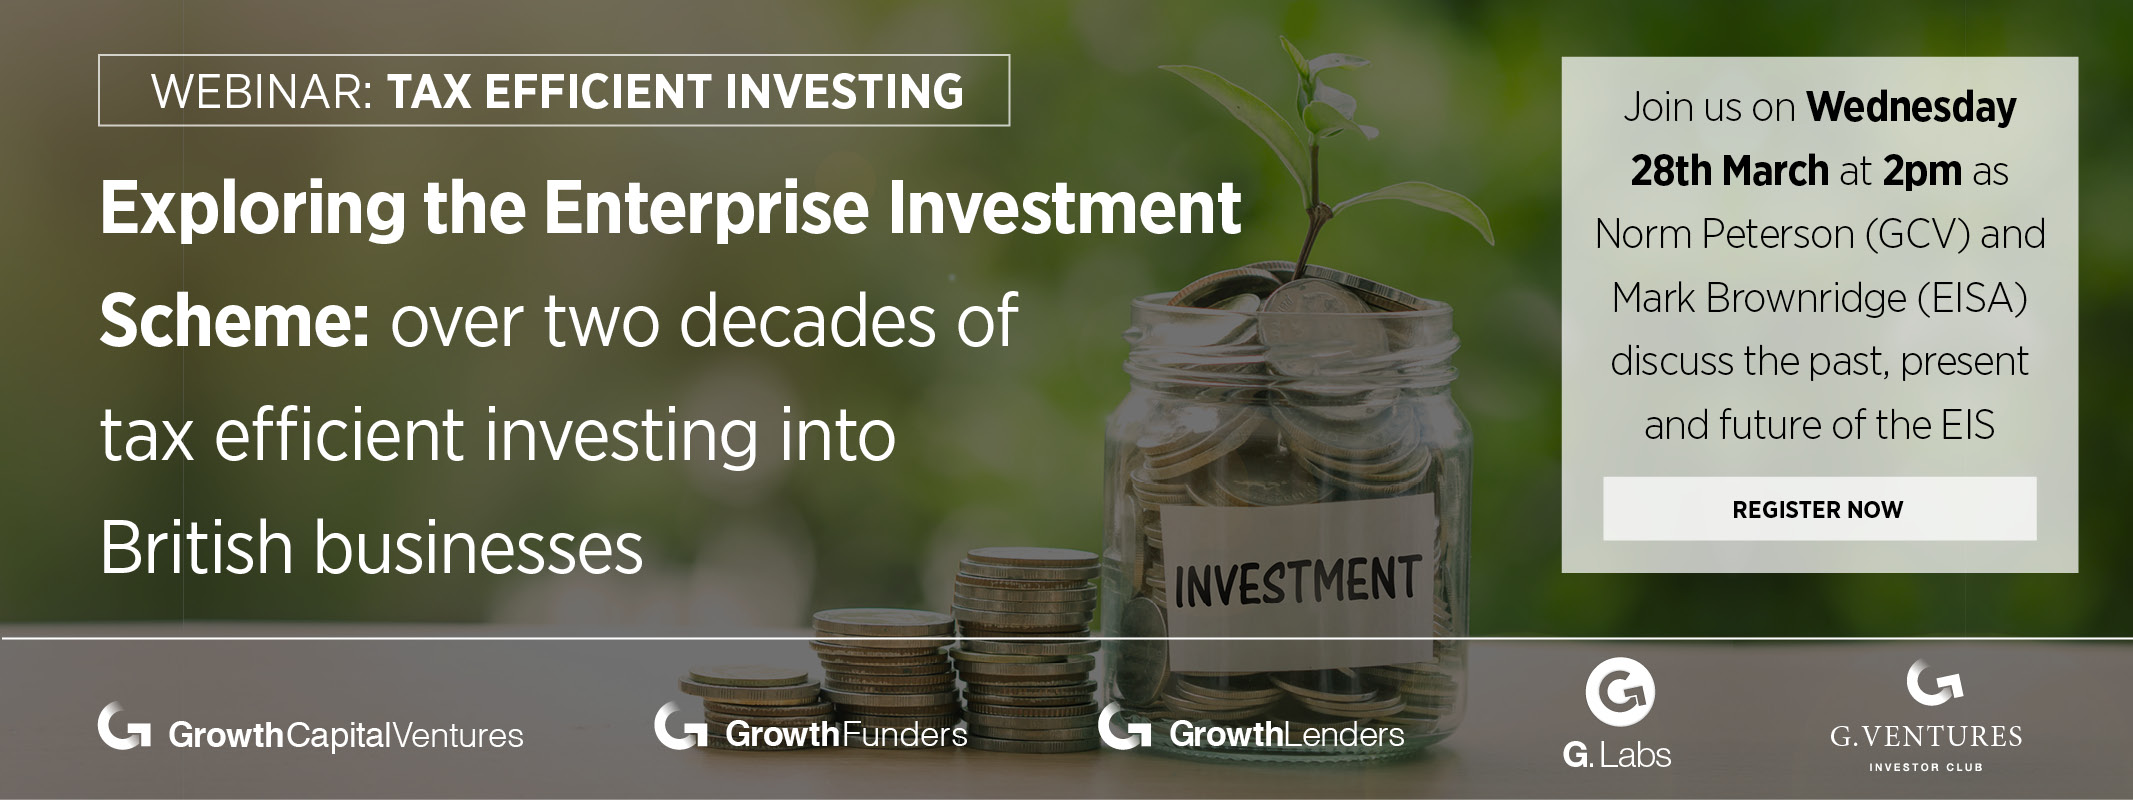 'Exploring The Enterprise-Investment Scheme' webinar on 28th March 2018